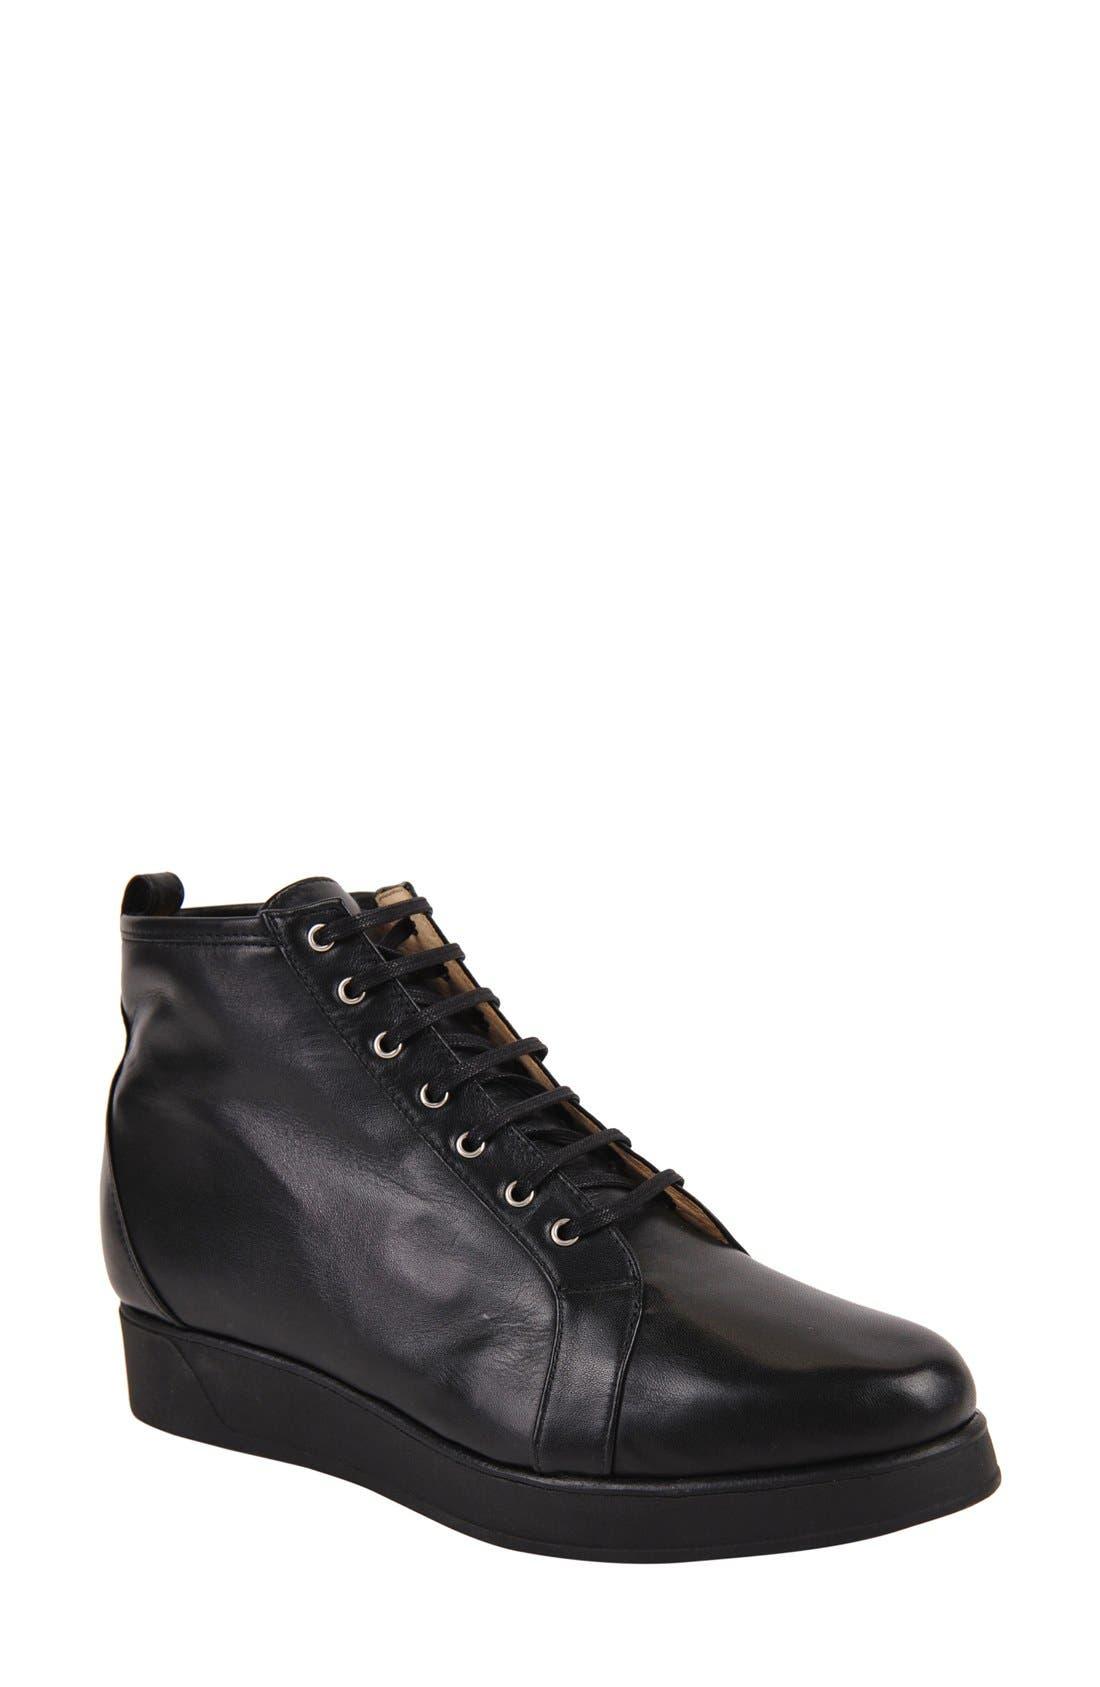 Alberta Bootie,                         Main,                         color, Black Leather